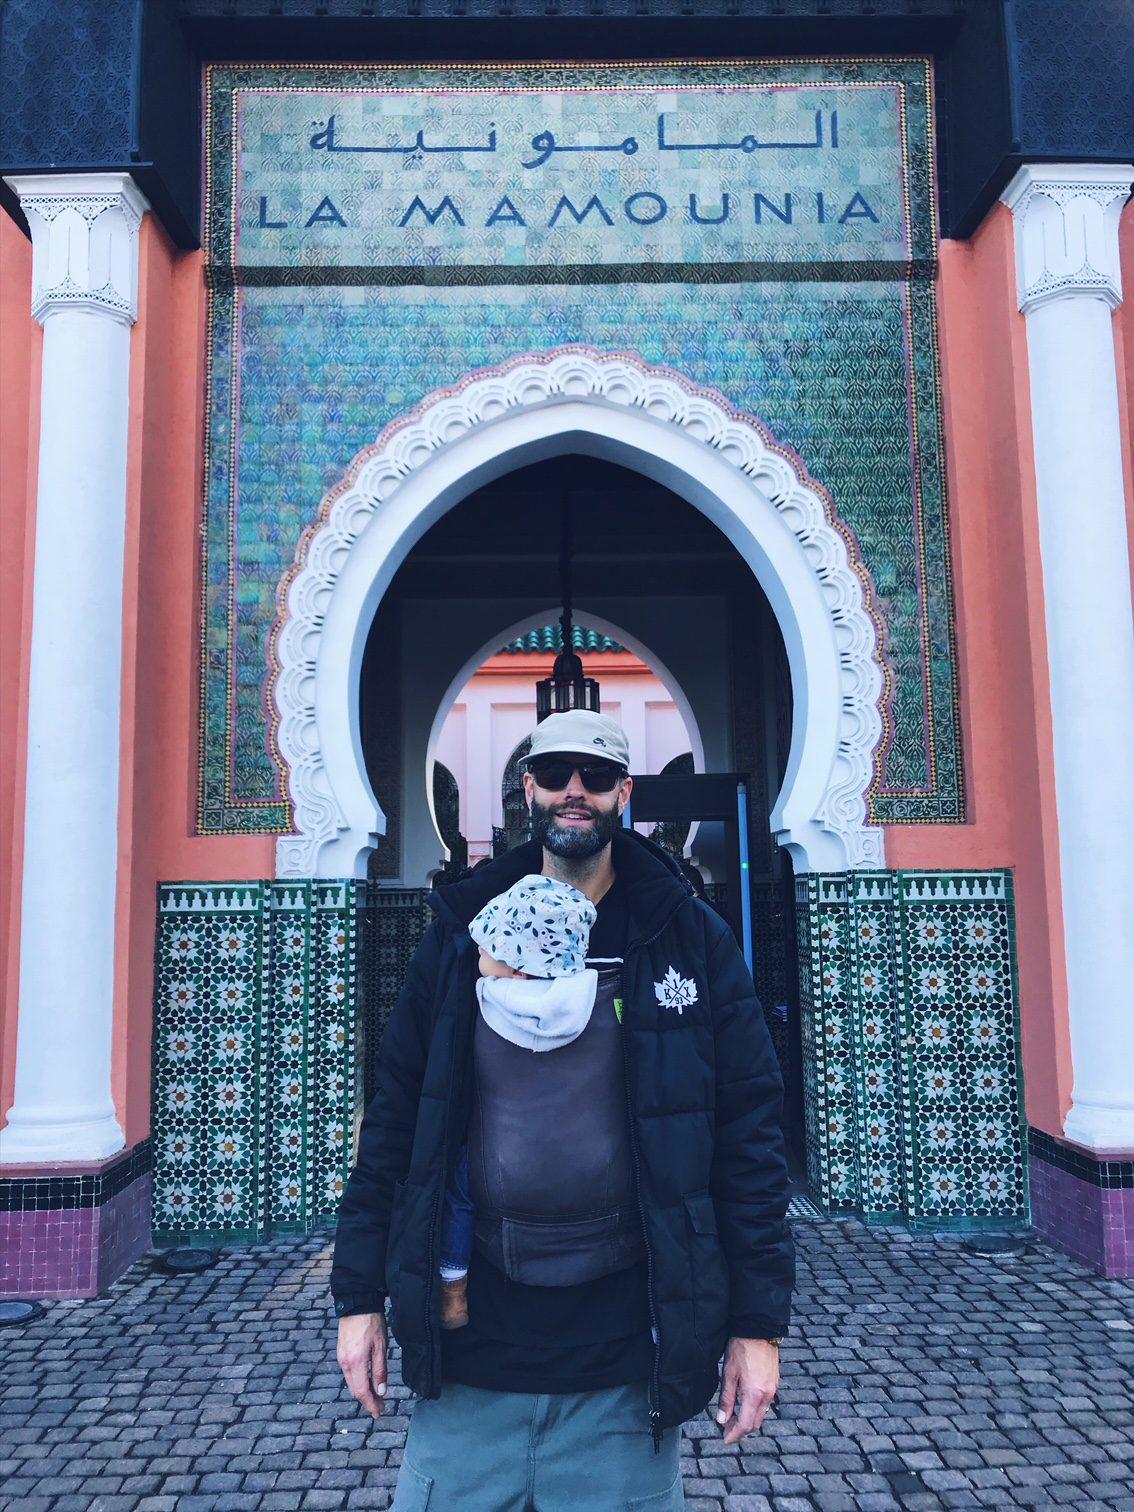 Voyage au Maroc Marrakech devant la mamounia